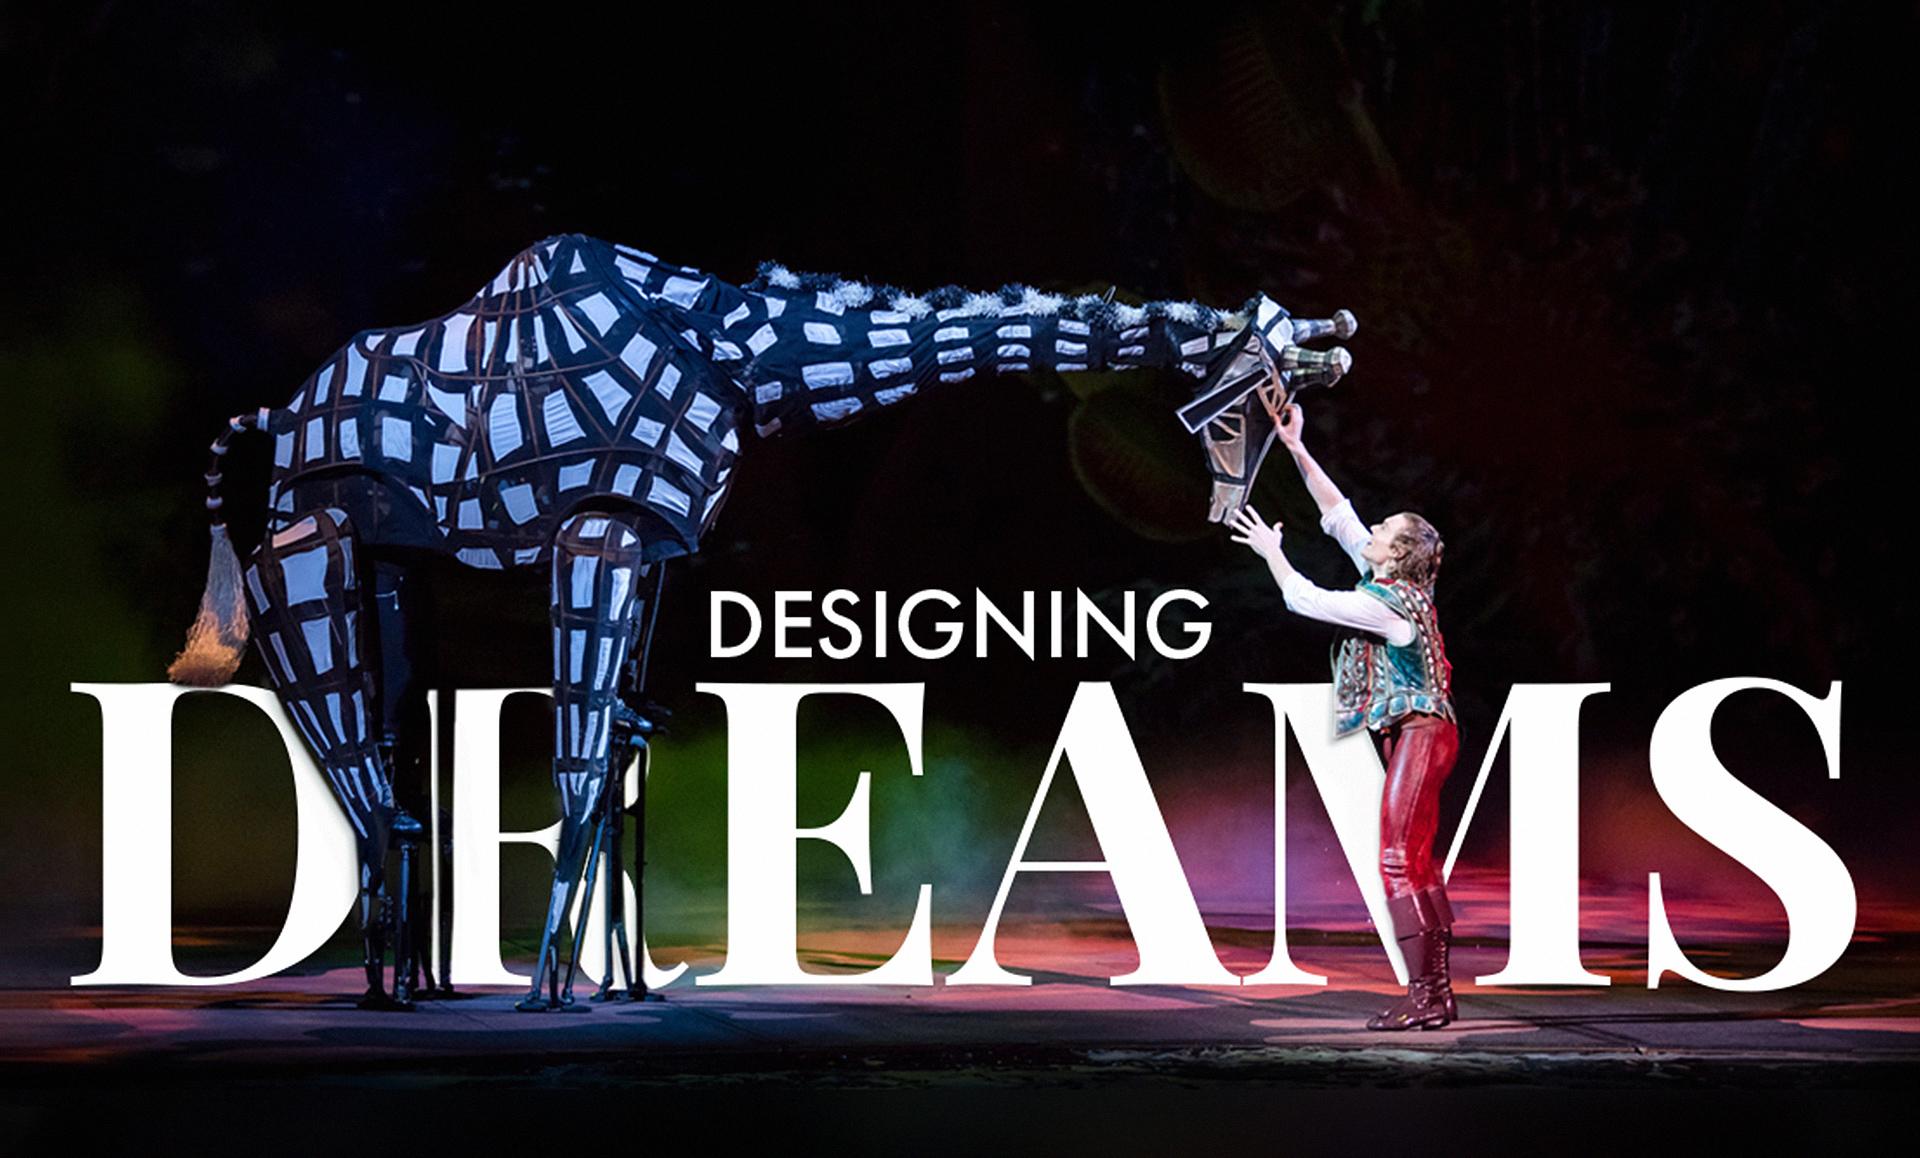 live entertainment marketing designing dreams image